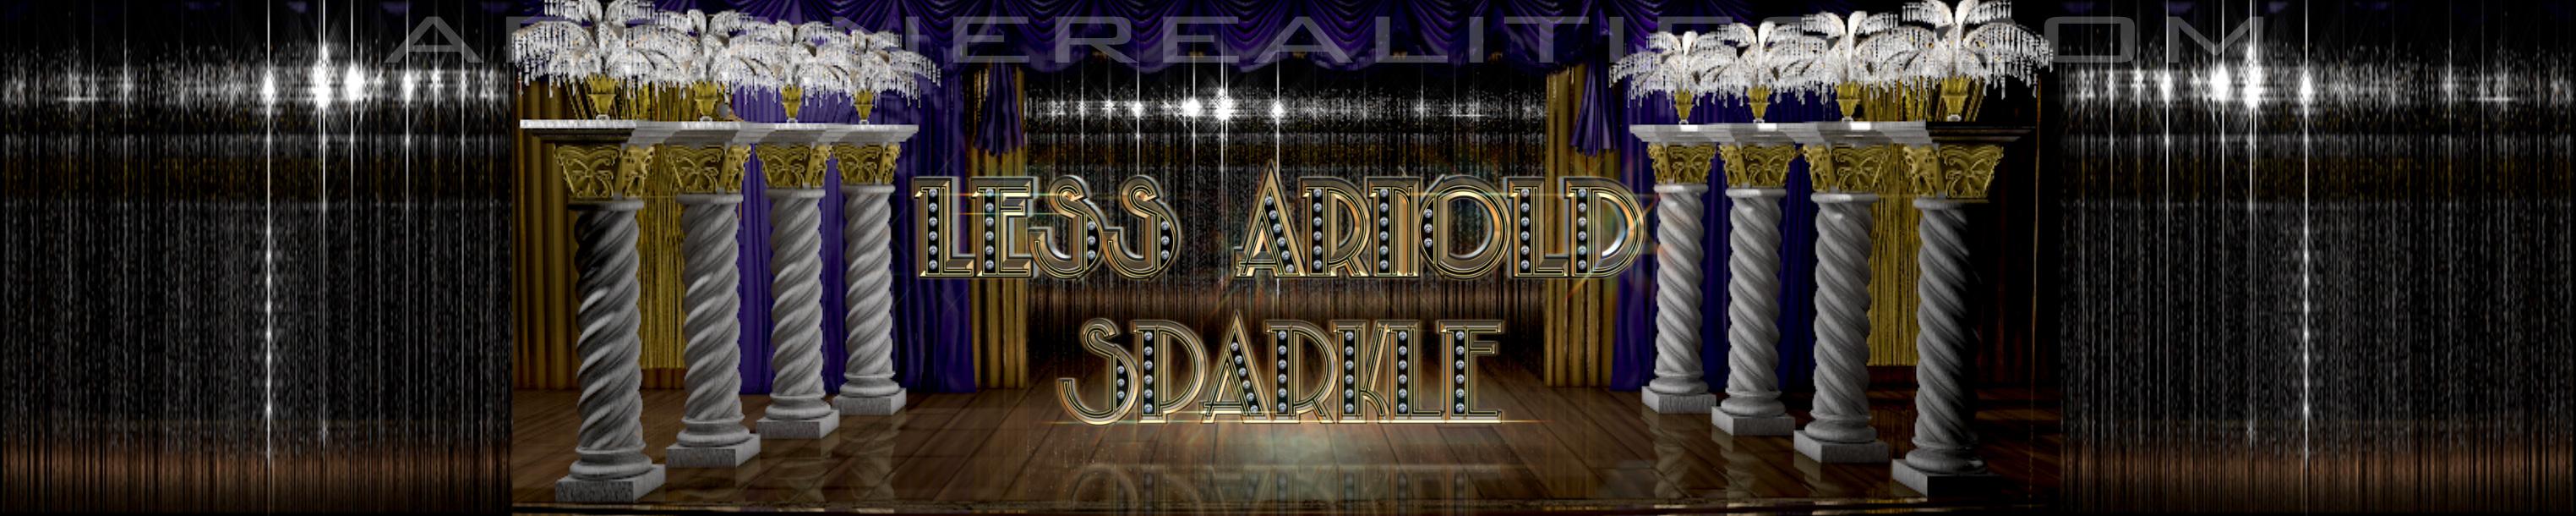 1_Les Arnold  3wSparkl.jpg